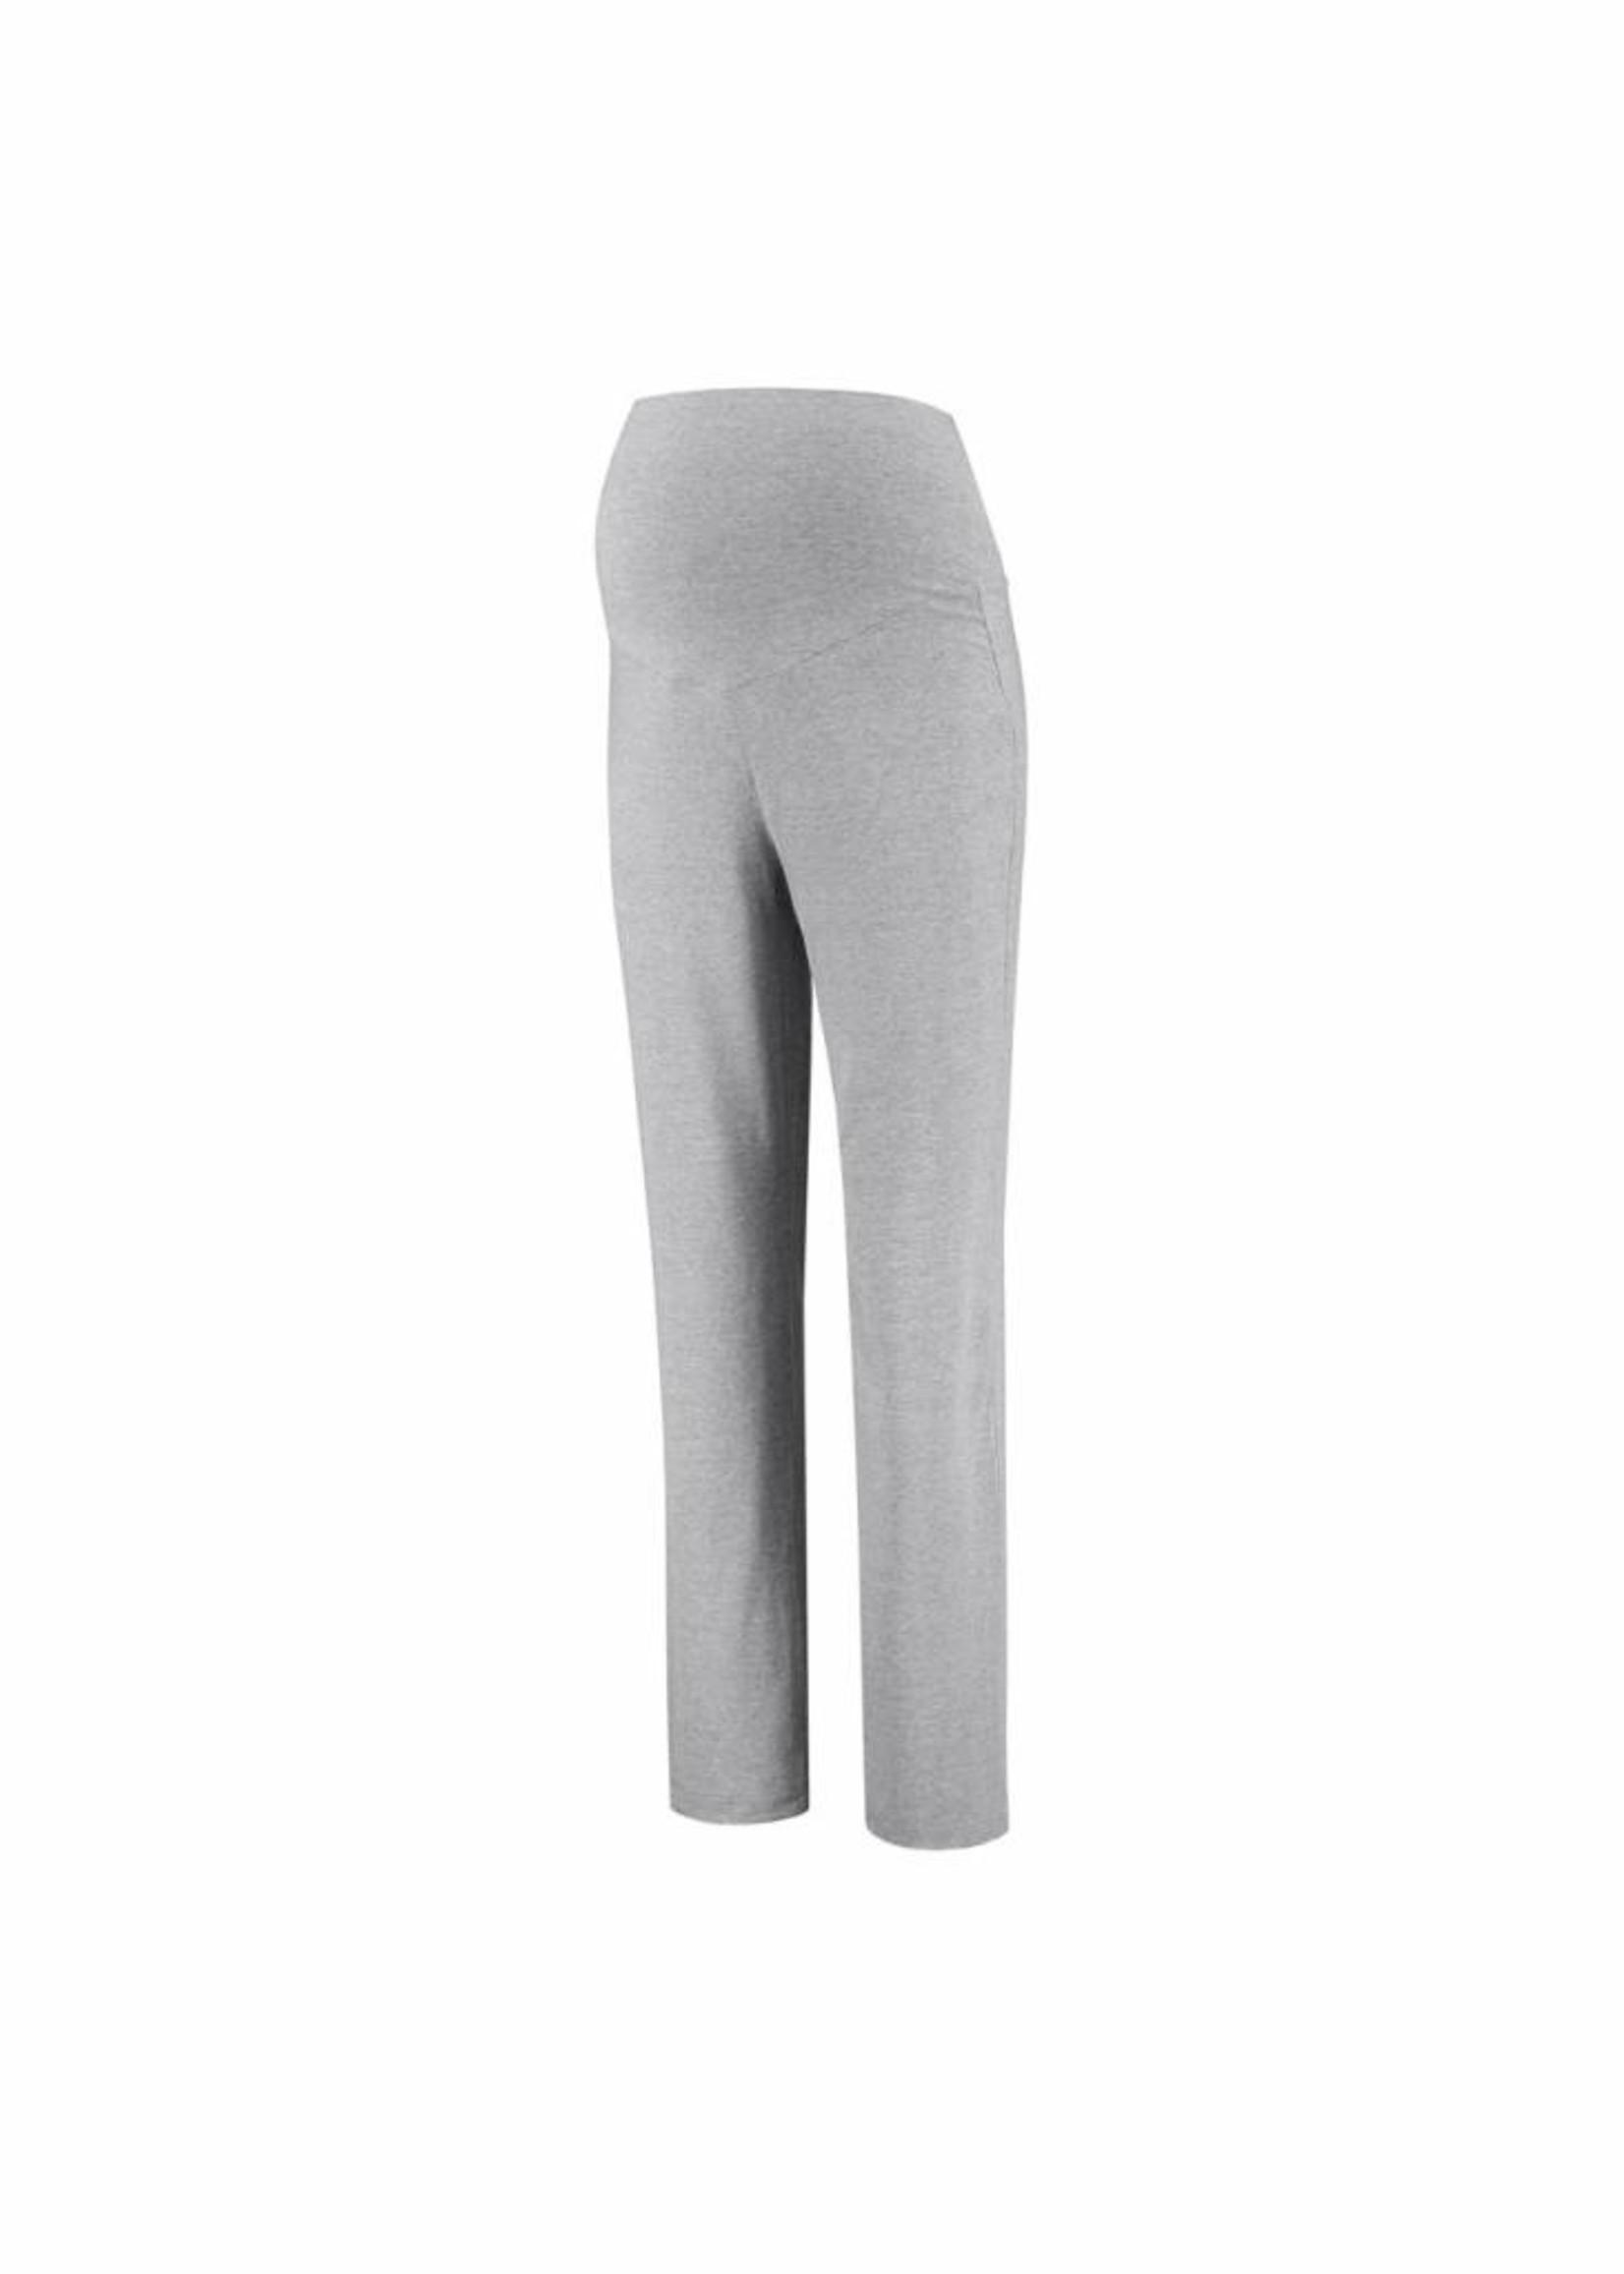 MAMSY Home Wear Pants Grey